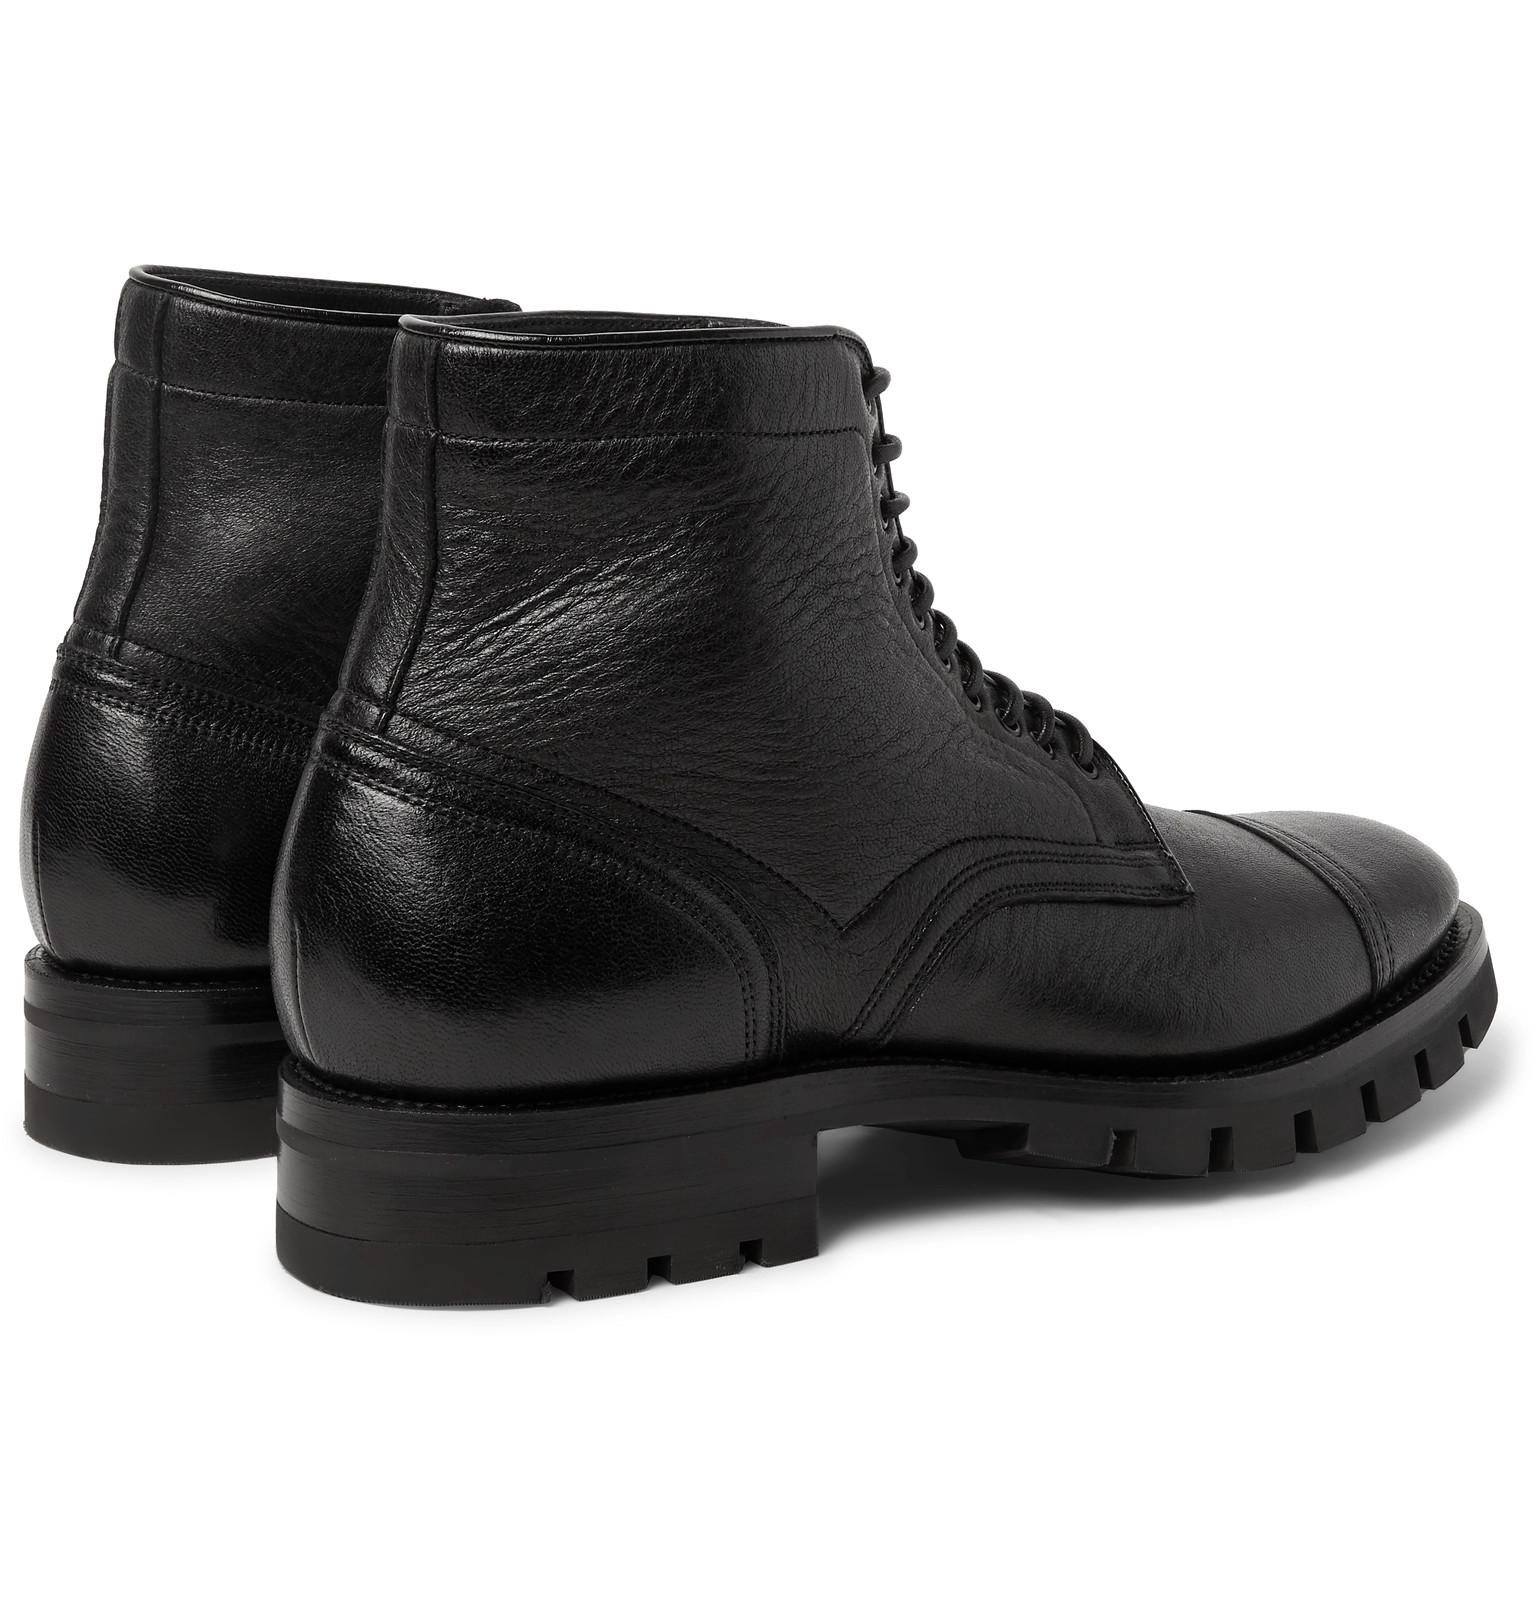 Boots Leather Santoni Grain Grain Full Santoni Full 1RXWqYgfpR